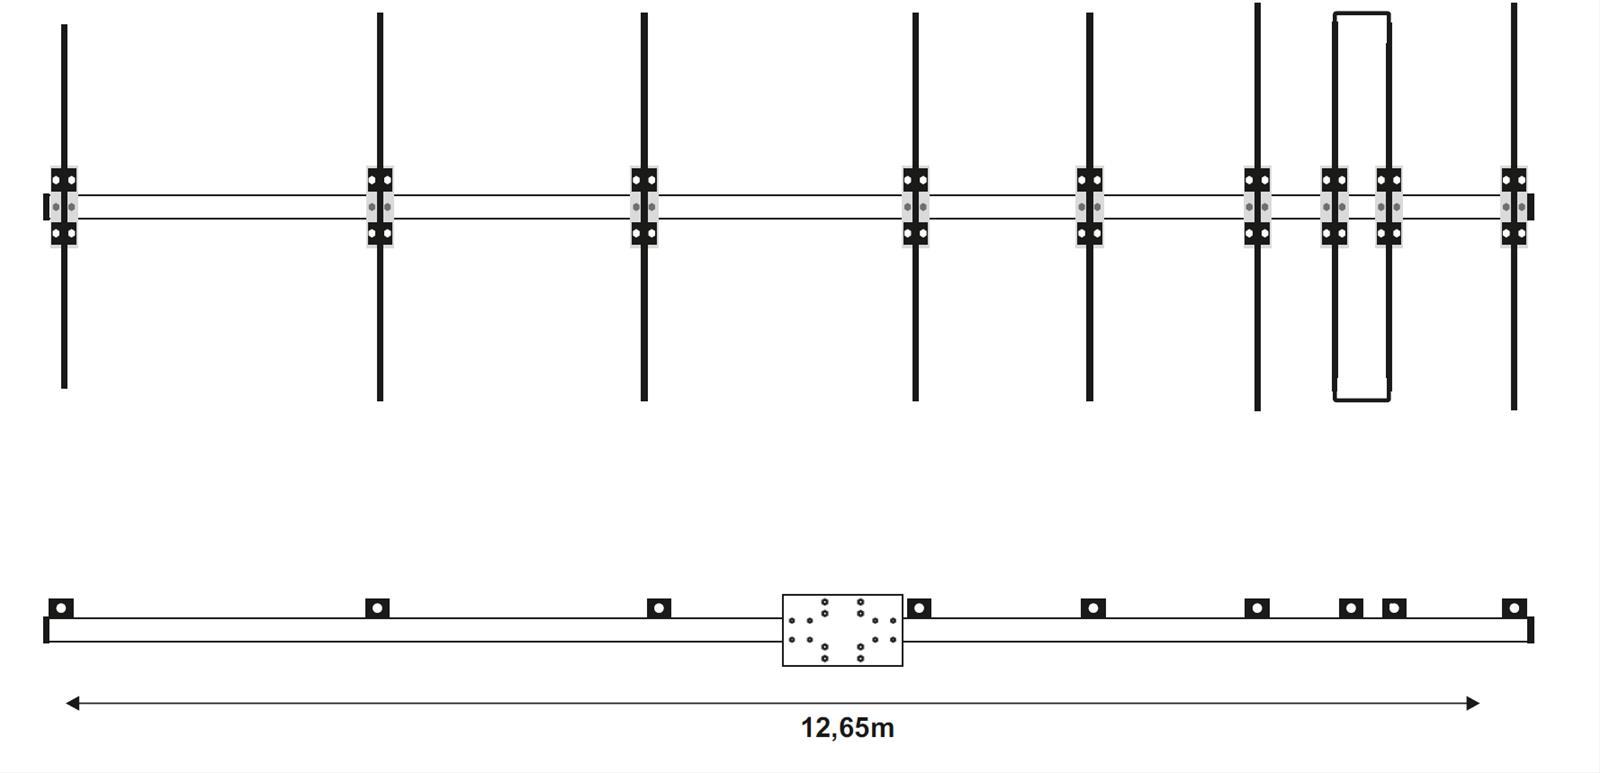 EAntenna VHF and UHF Directional Antennas 50LFA8HD